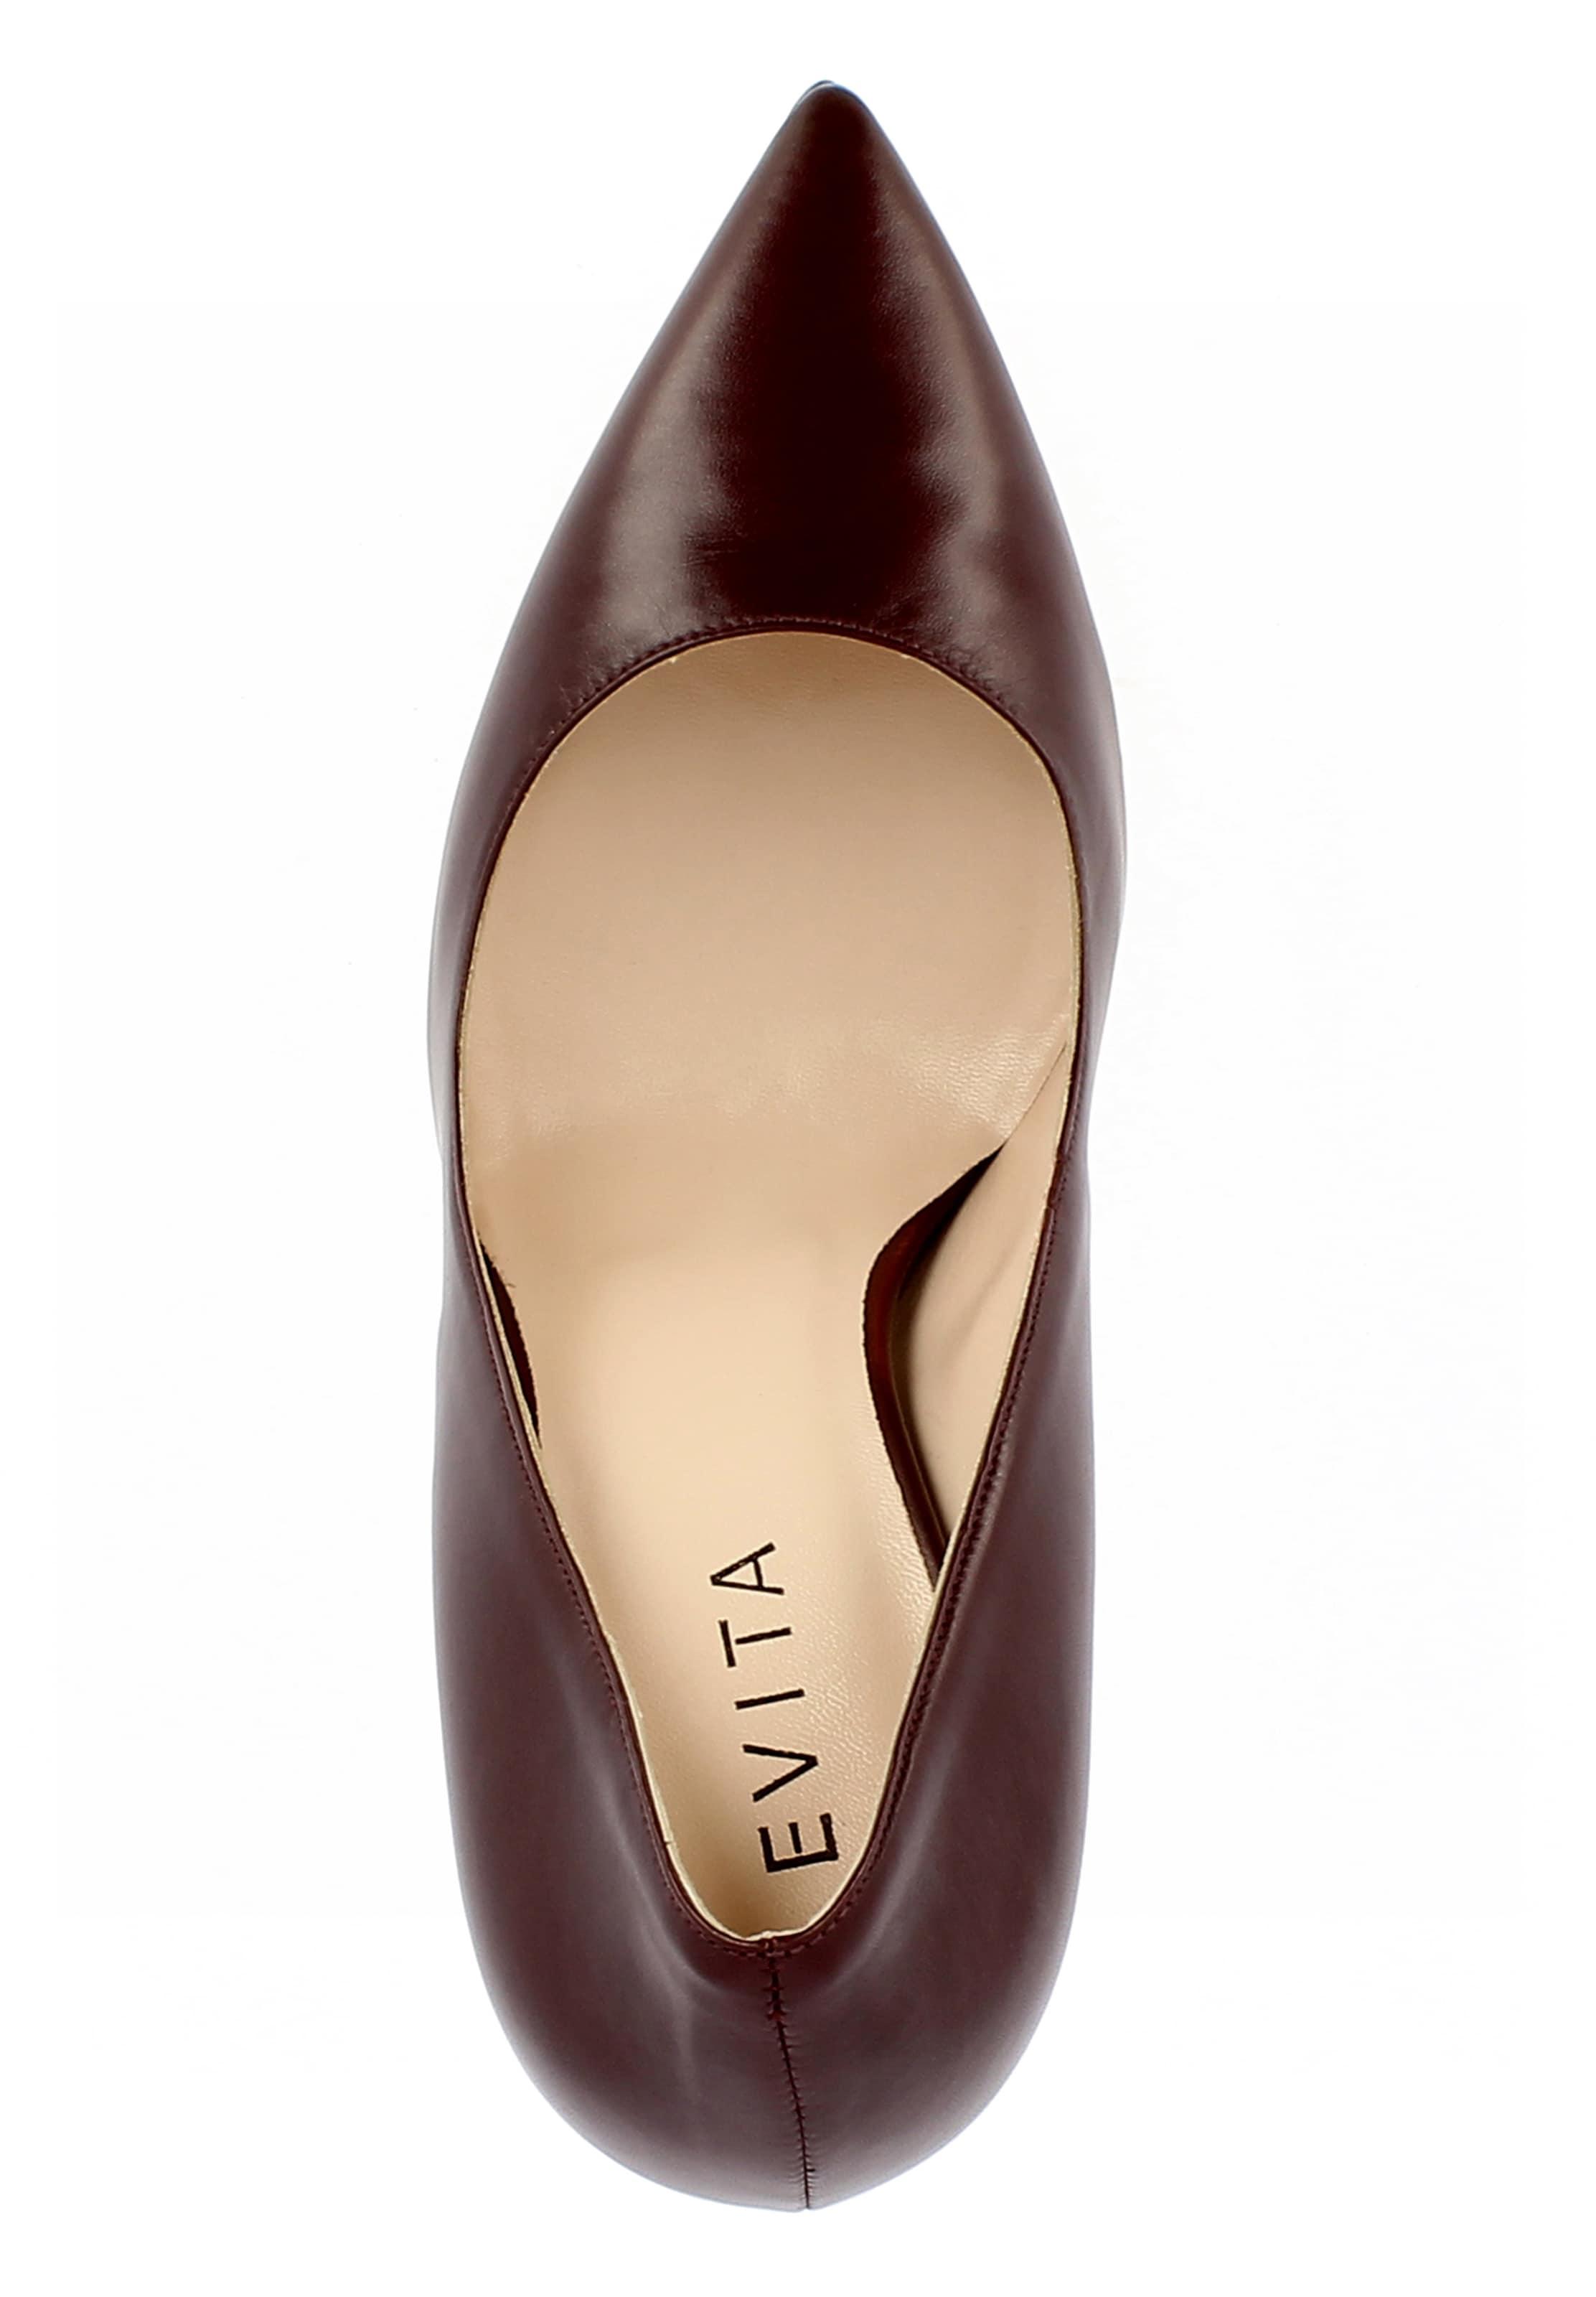 Pumps In Pumps In Evita Evita Bordeaux 'alina' 'alina' Bordeaux Evita 'alina' Pumps 0kPwO8n